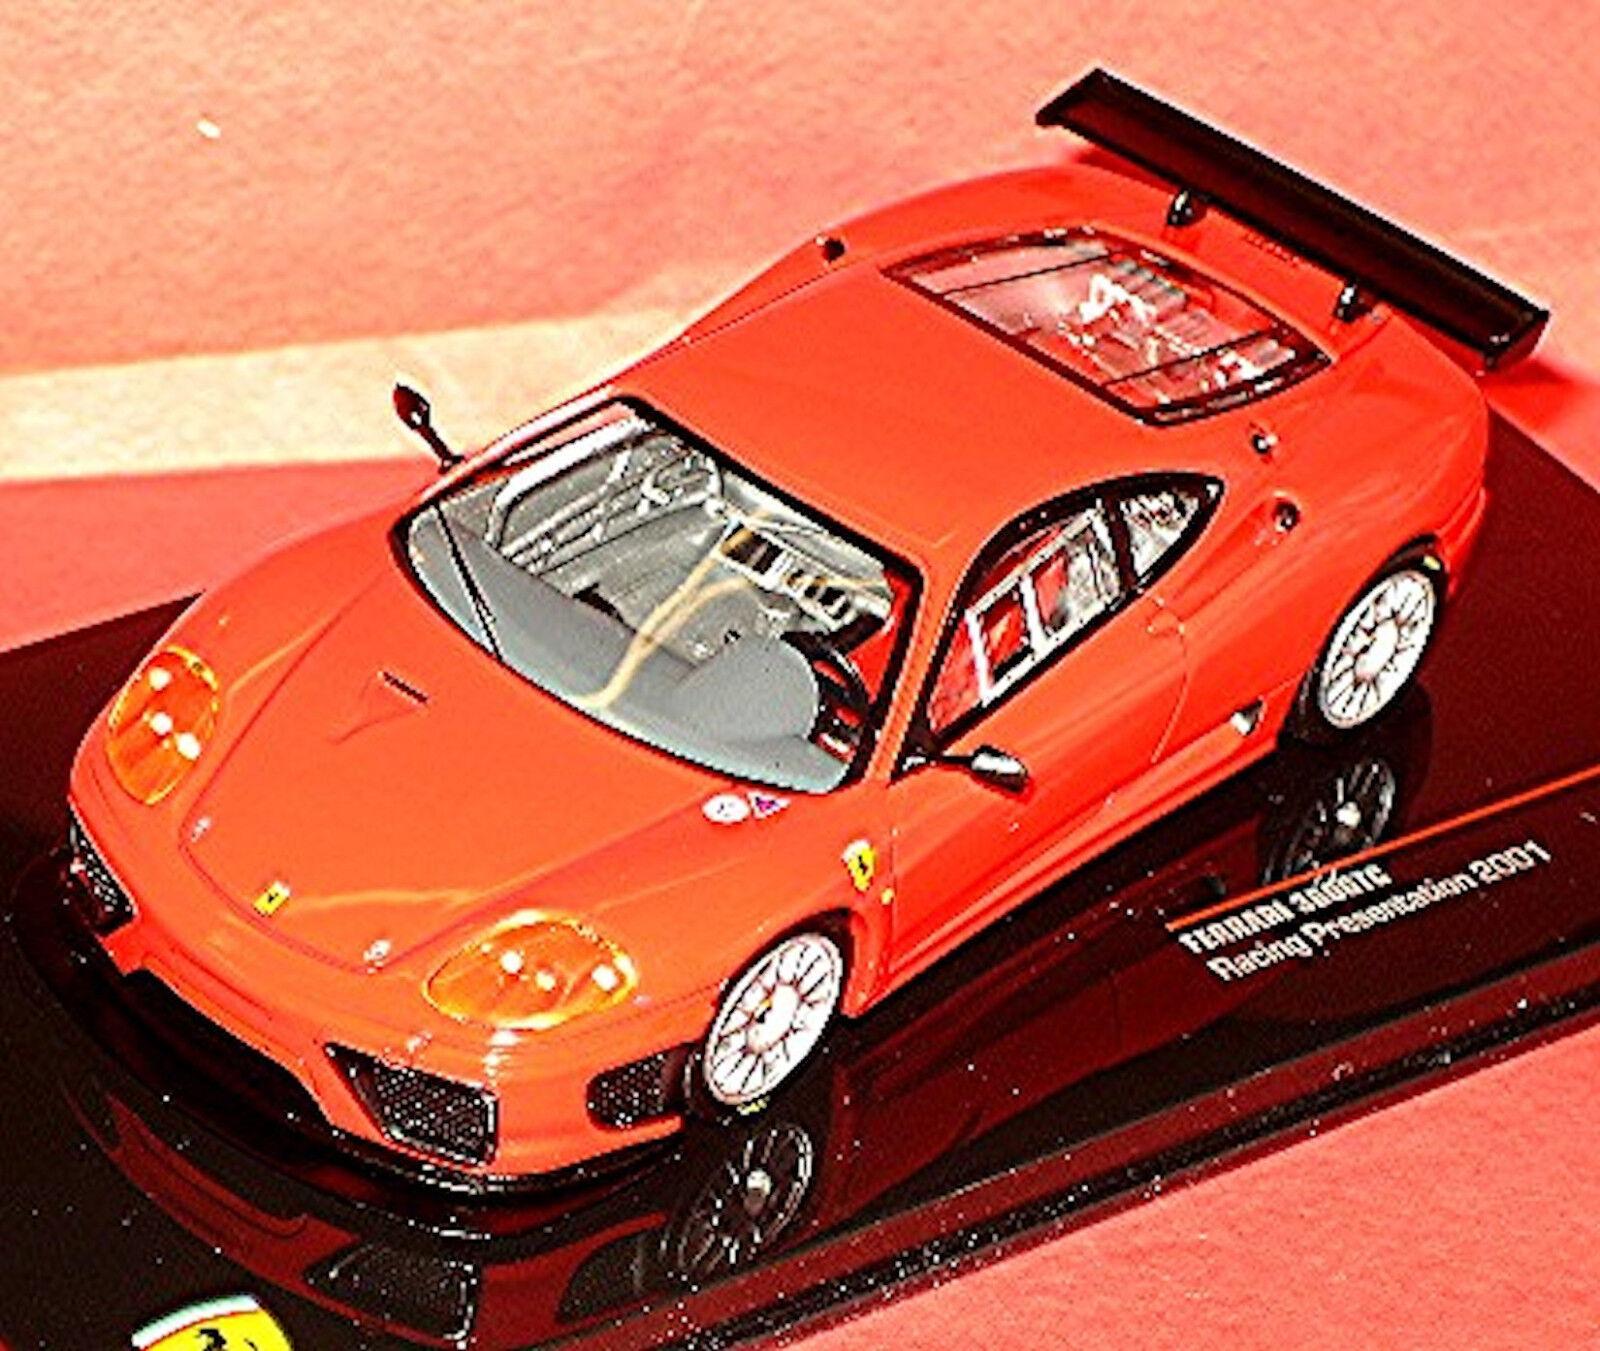 Ferrari 360 GTC RACING PRESENTATION 2001 Street Version Red 1 43 IXO fer028